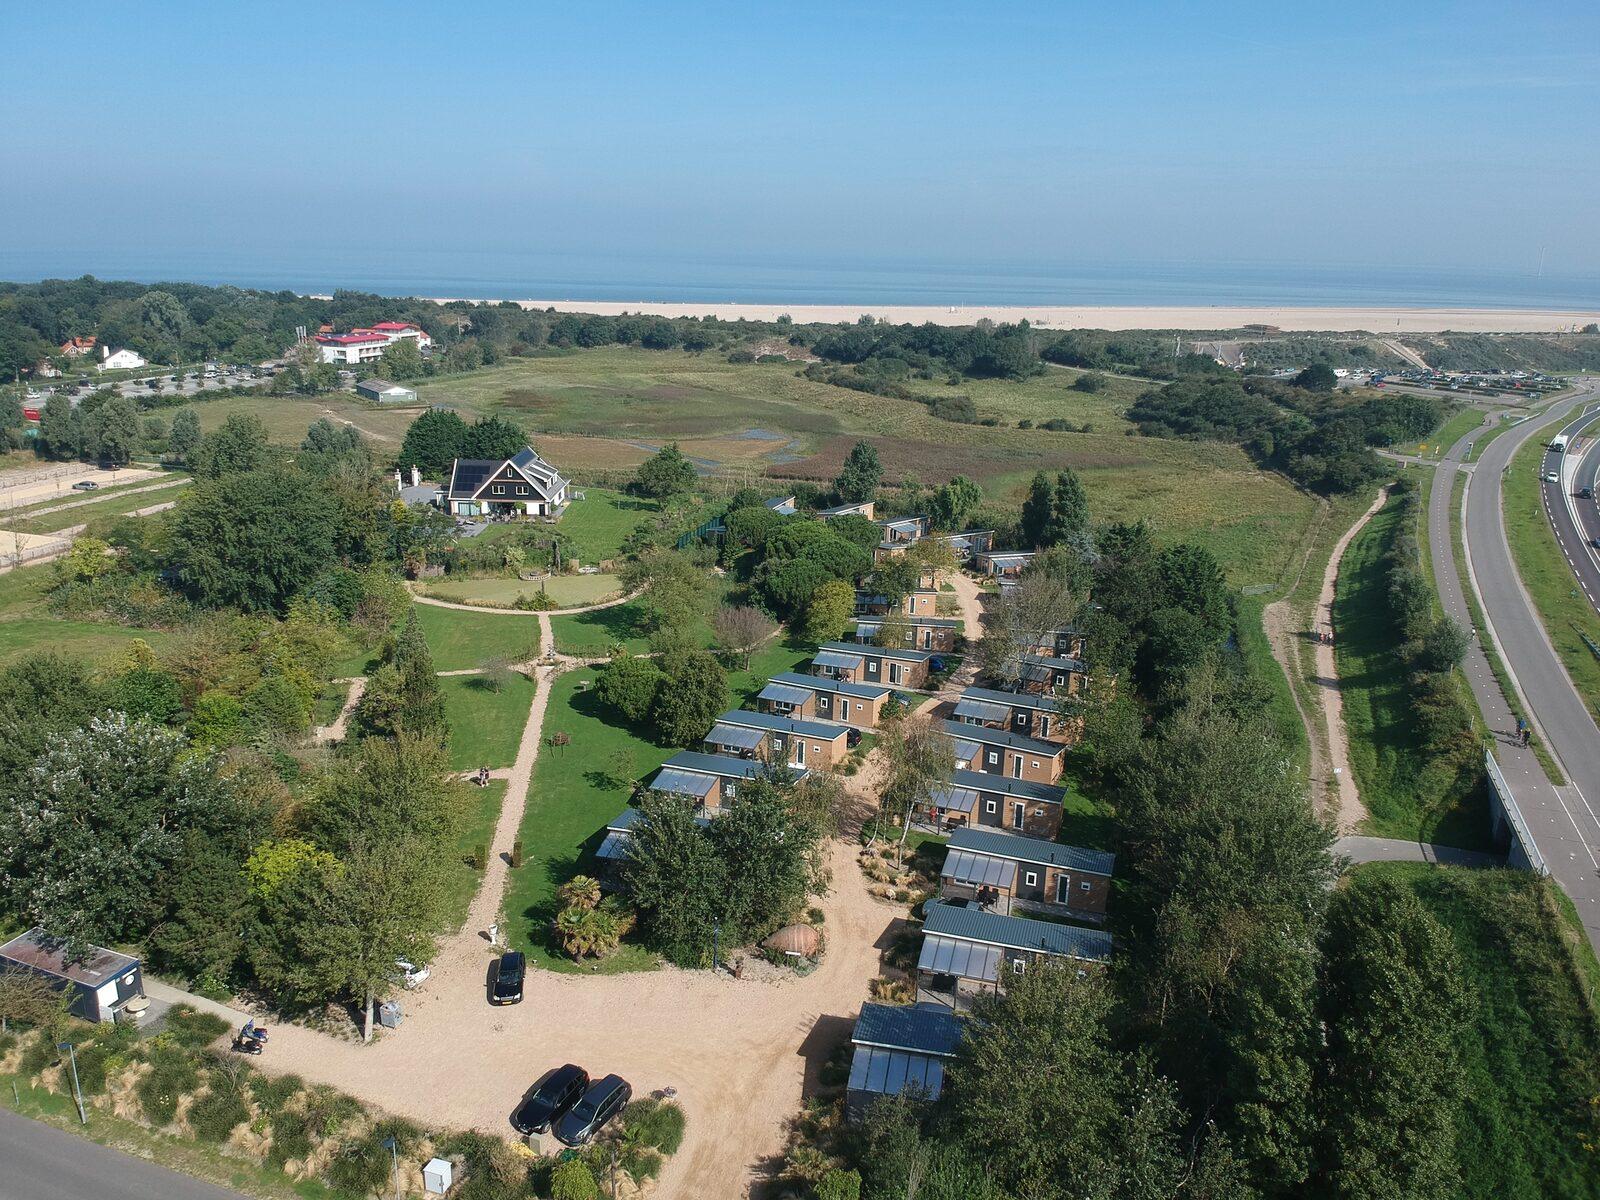 Chalet - Holidaypark Fort den Haak | Vrouwenpolder (Pet allowed)